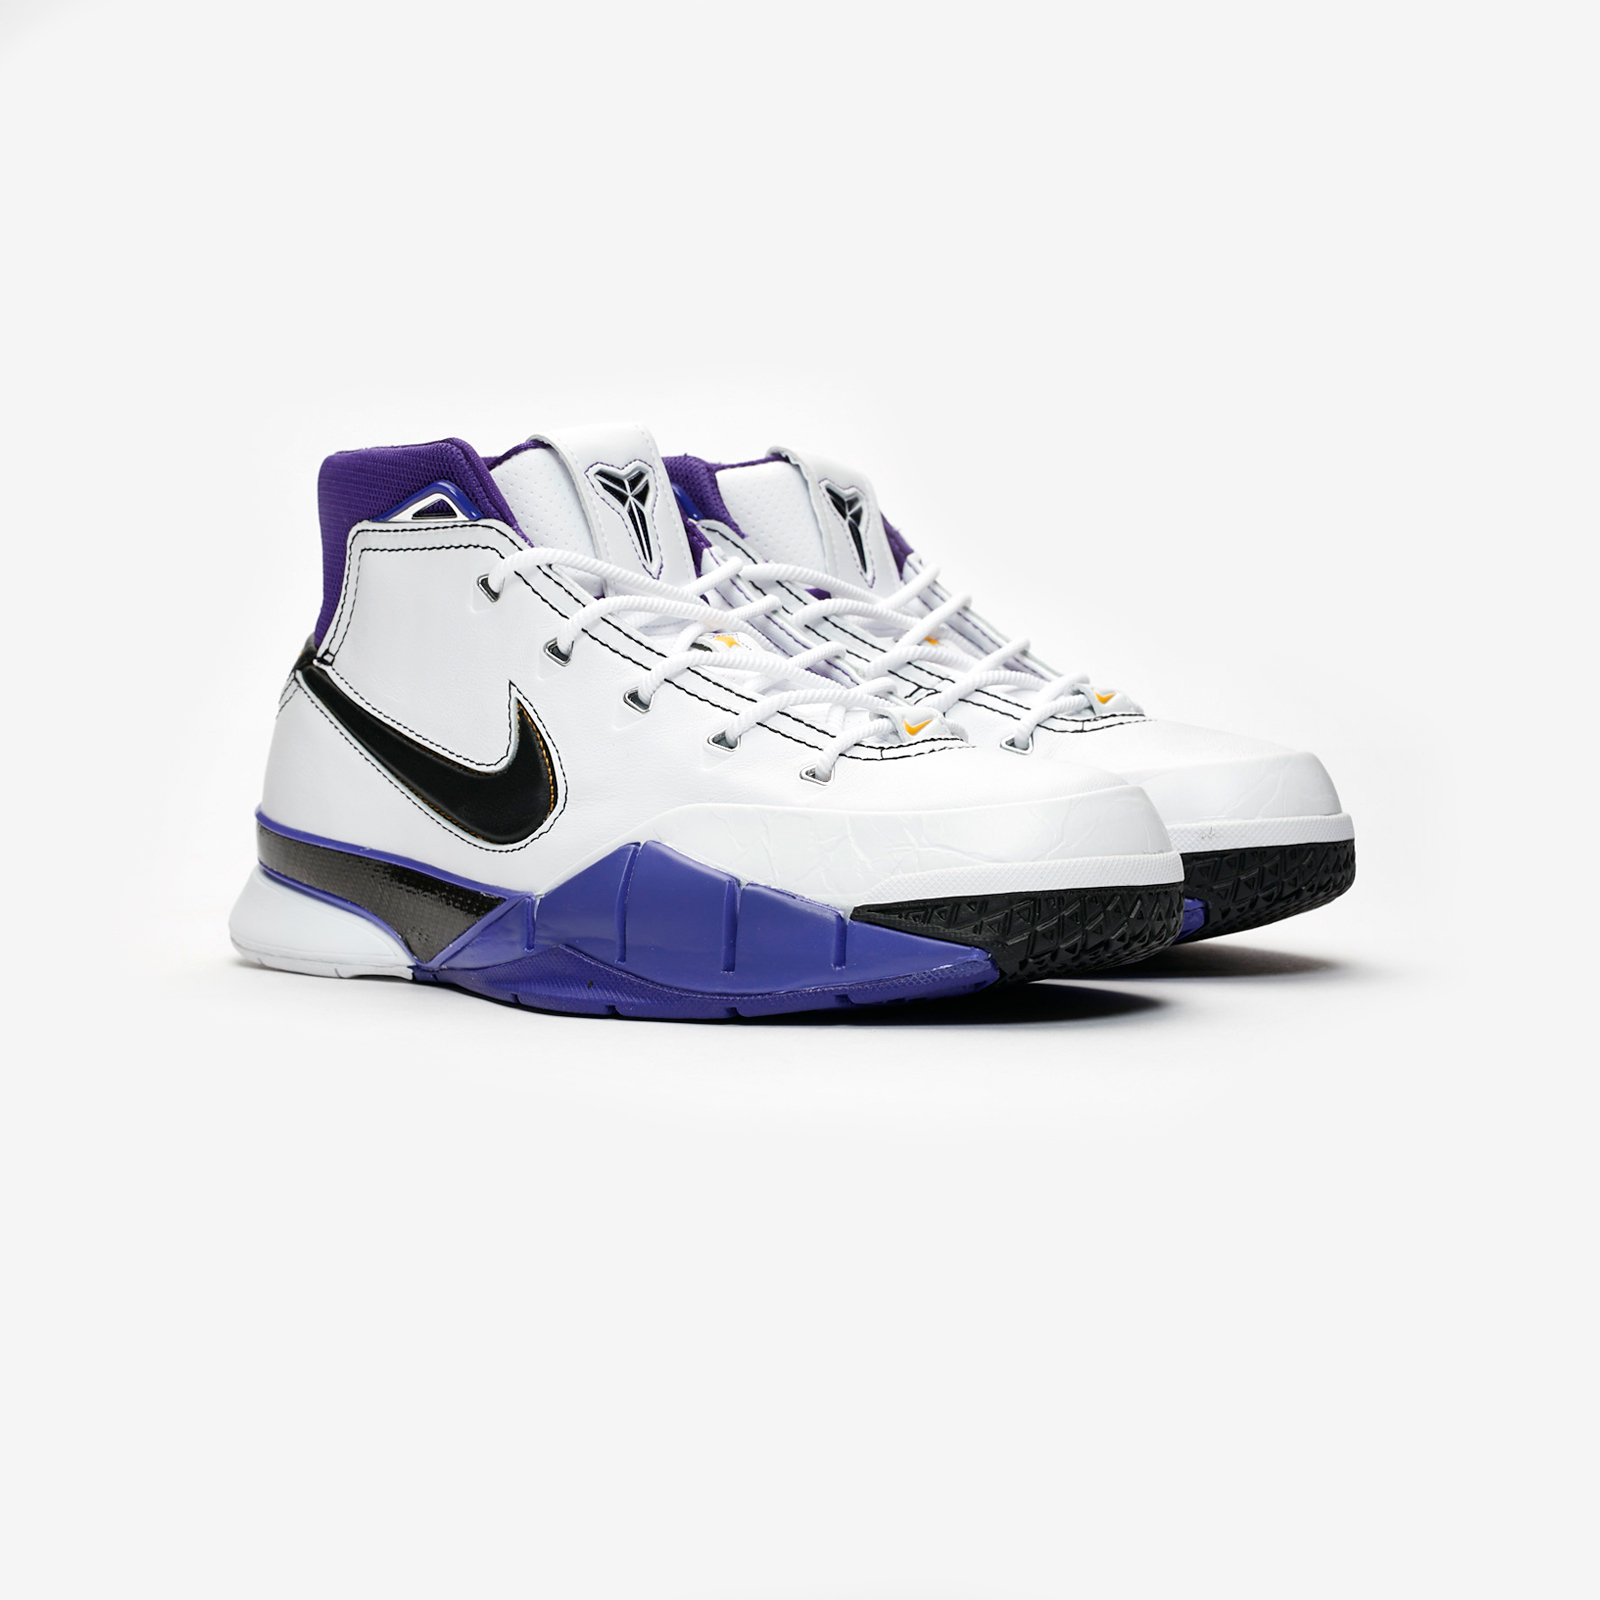 99e8886648e Nike Kobe 1 Protro - Aq2728-105 - Sneakersnstuff